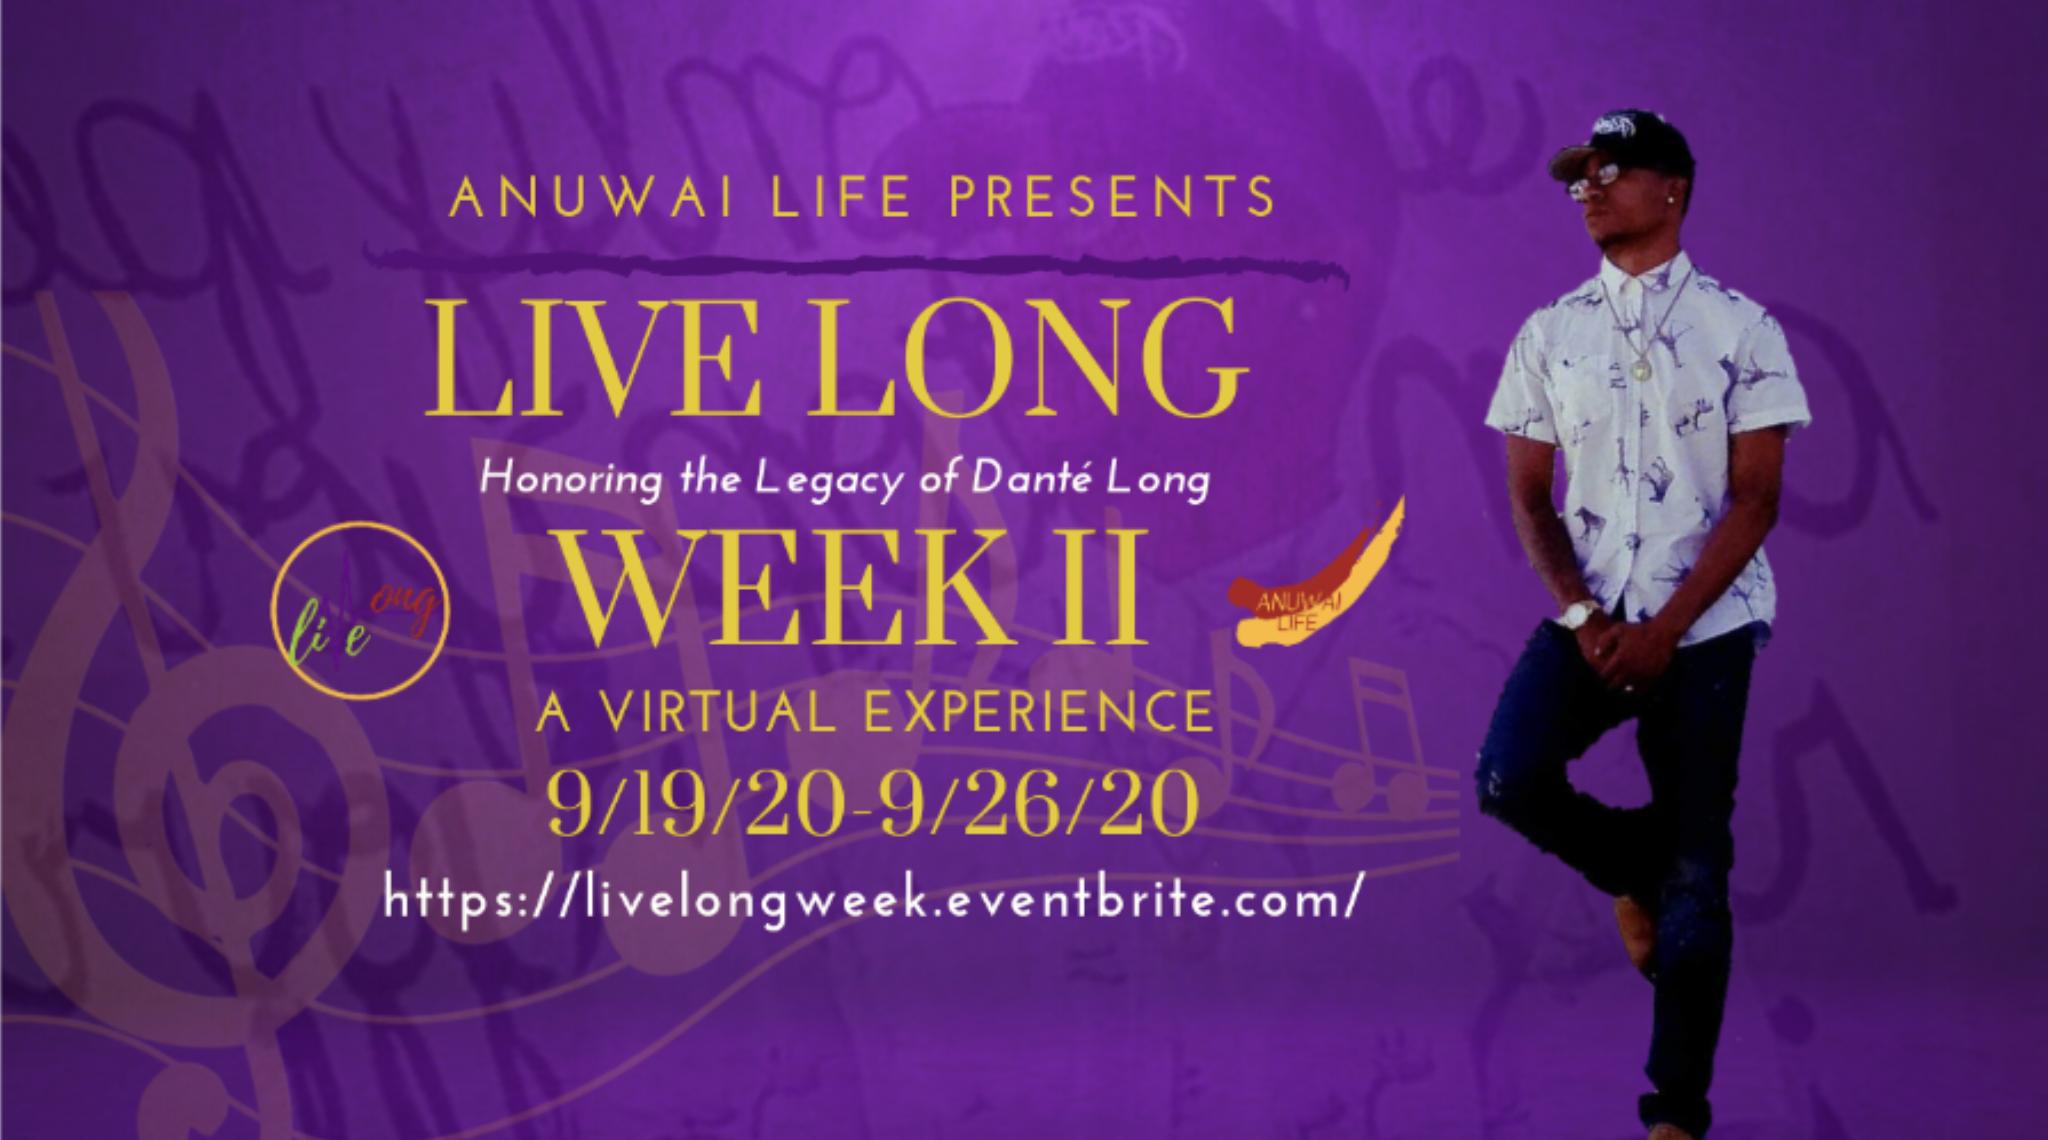 Live Long Week